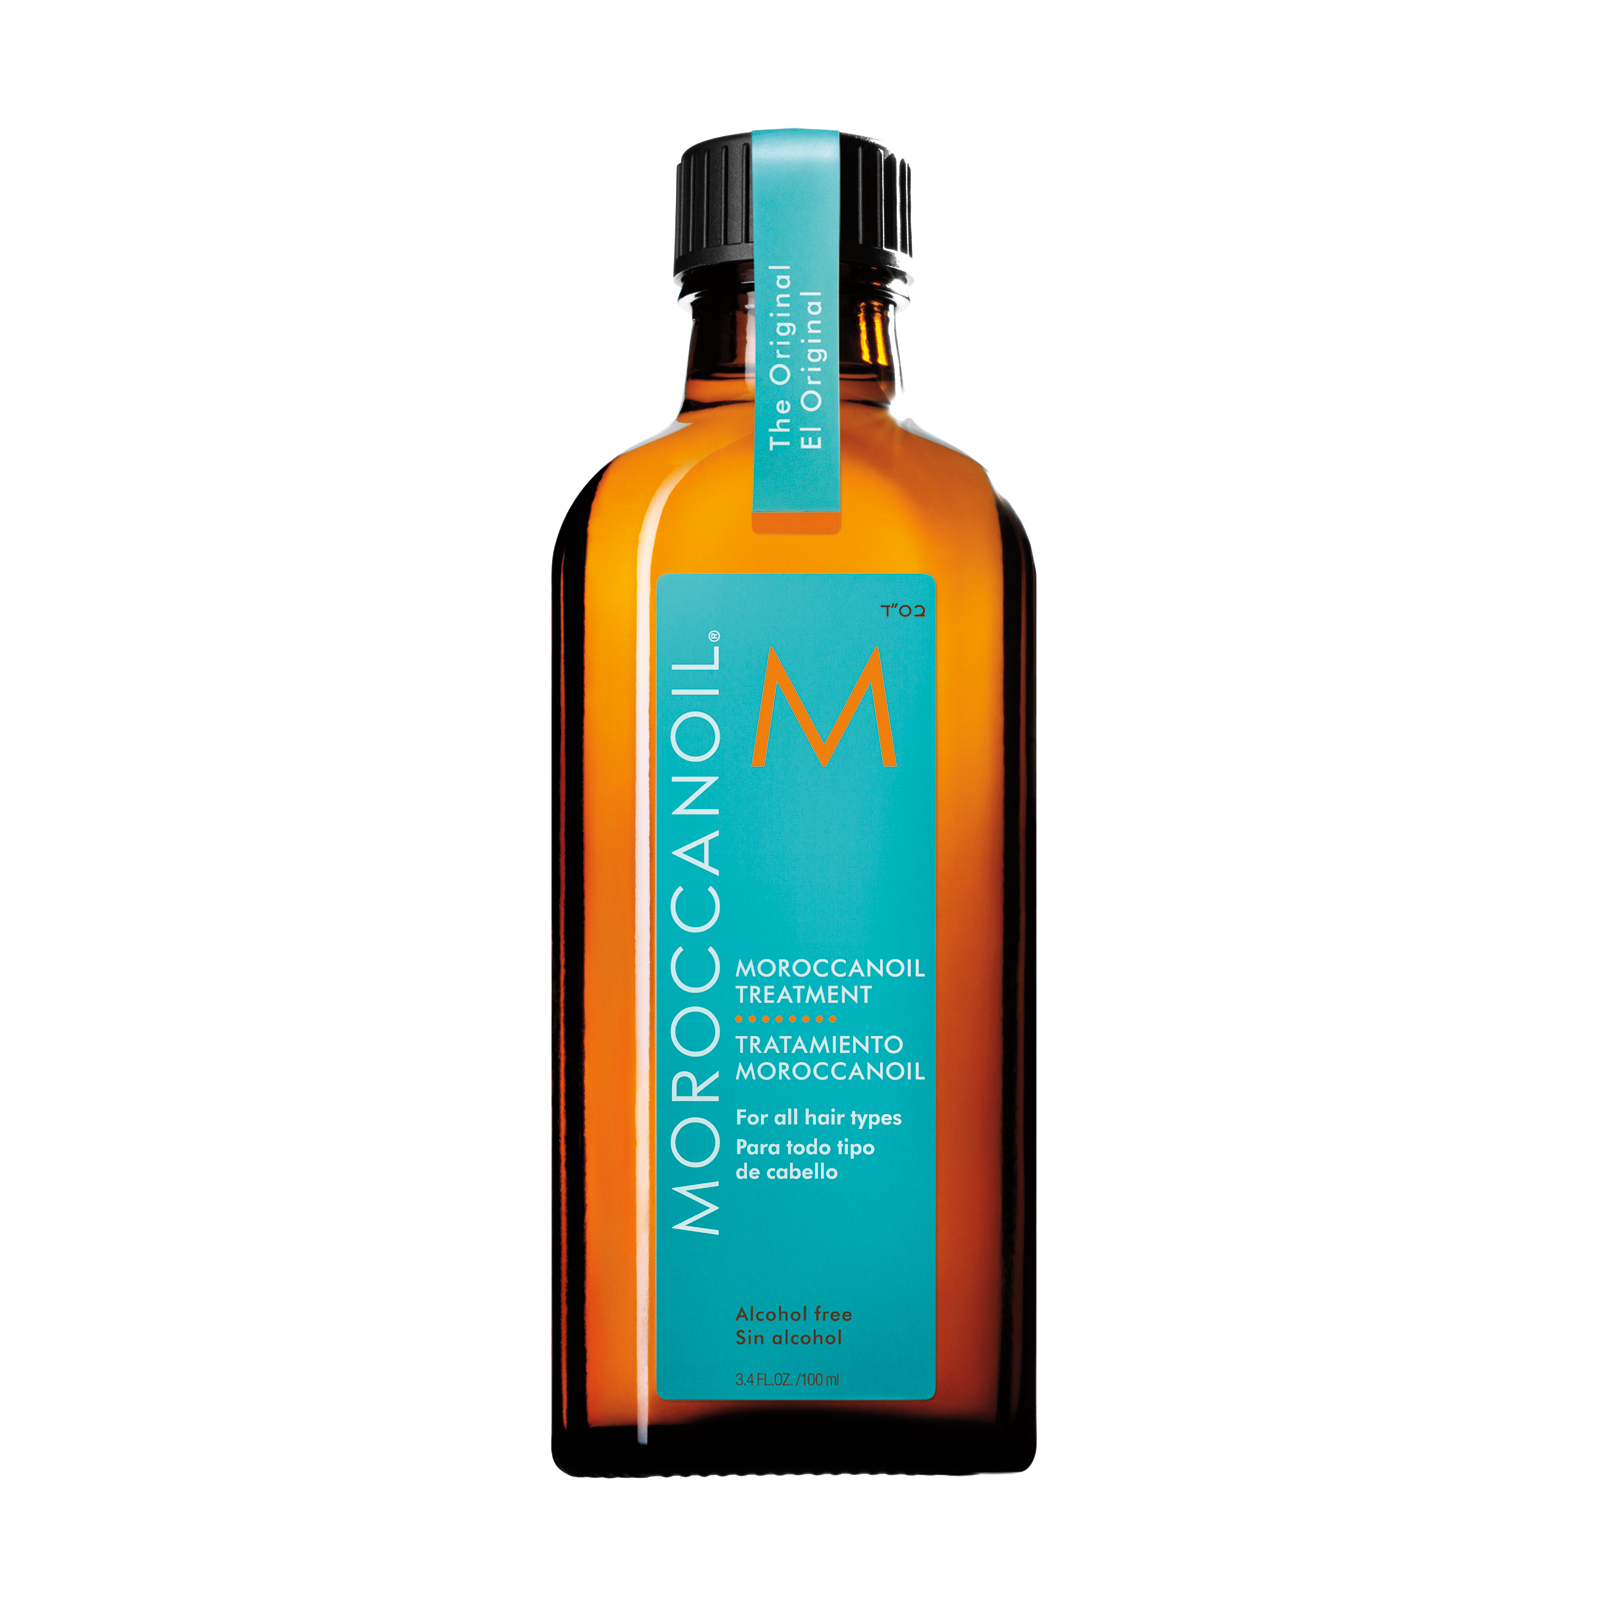 Moroccanoil_Treatment_100ml_1392288768.png